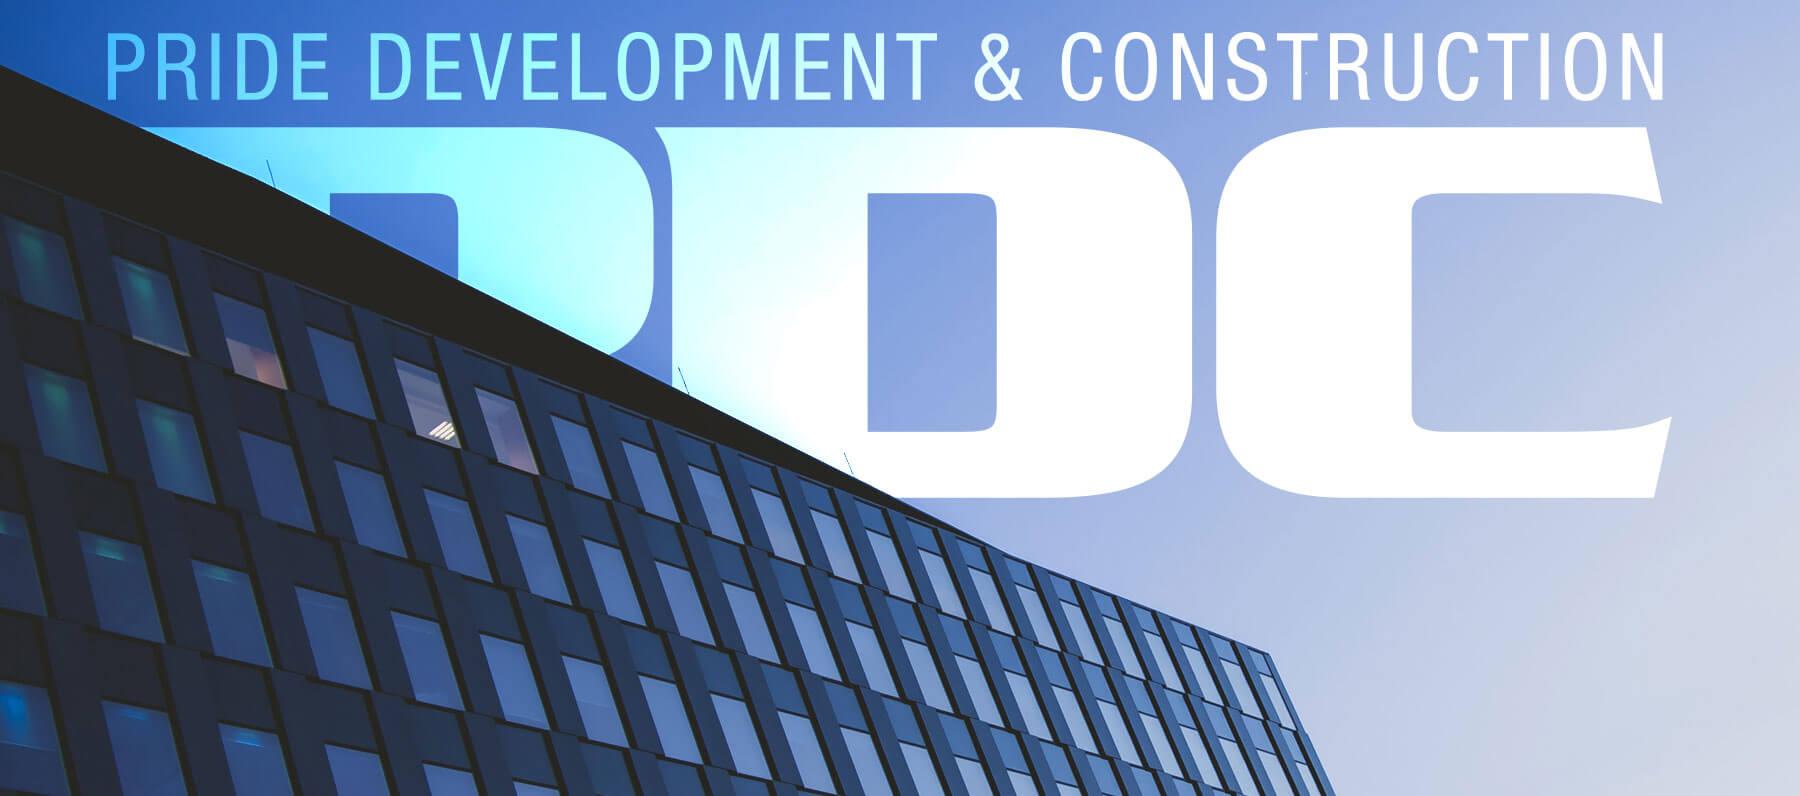 Pride development & construction